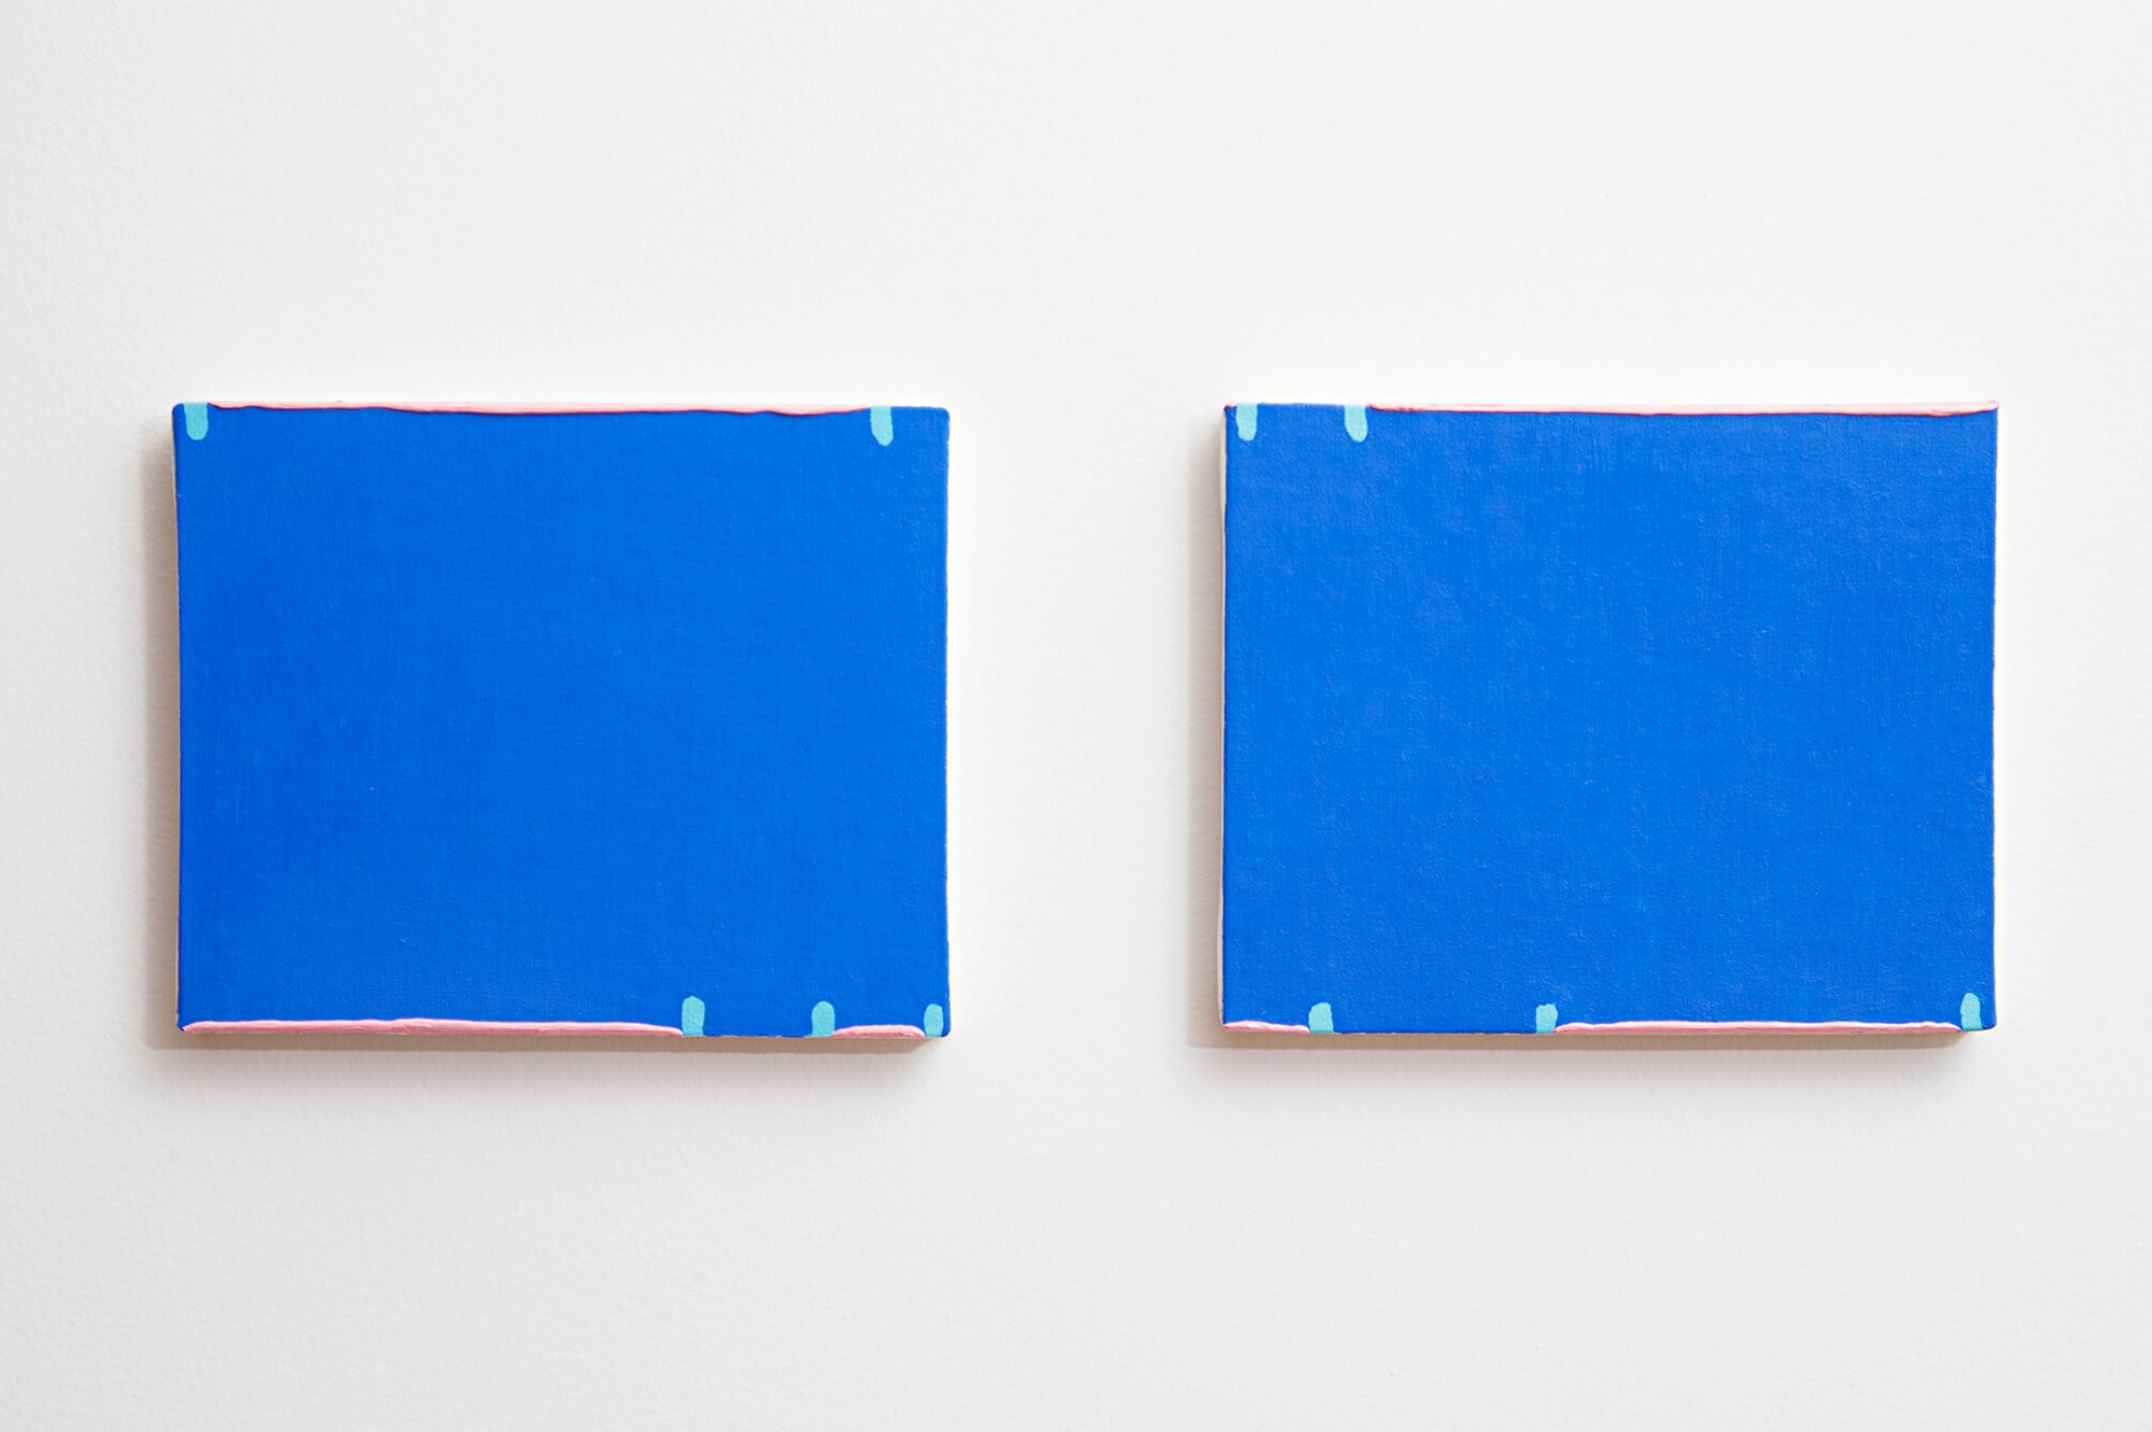 Paulo Monteiro, <em>untitled</em>, 2013, oil on canvas, 20 × 25 cm (each) - Mendes Wood DM